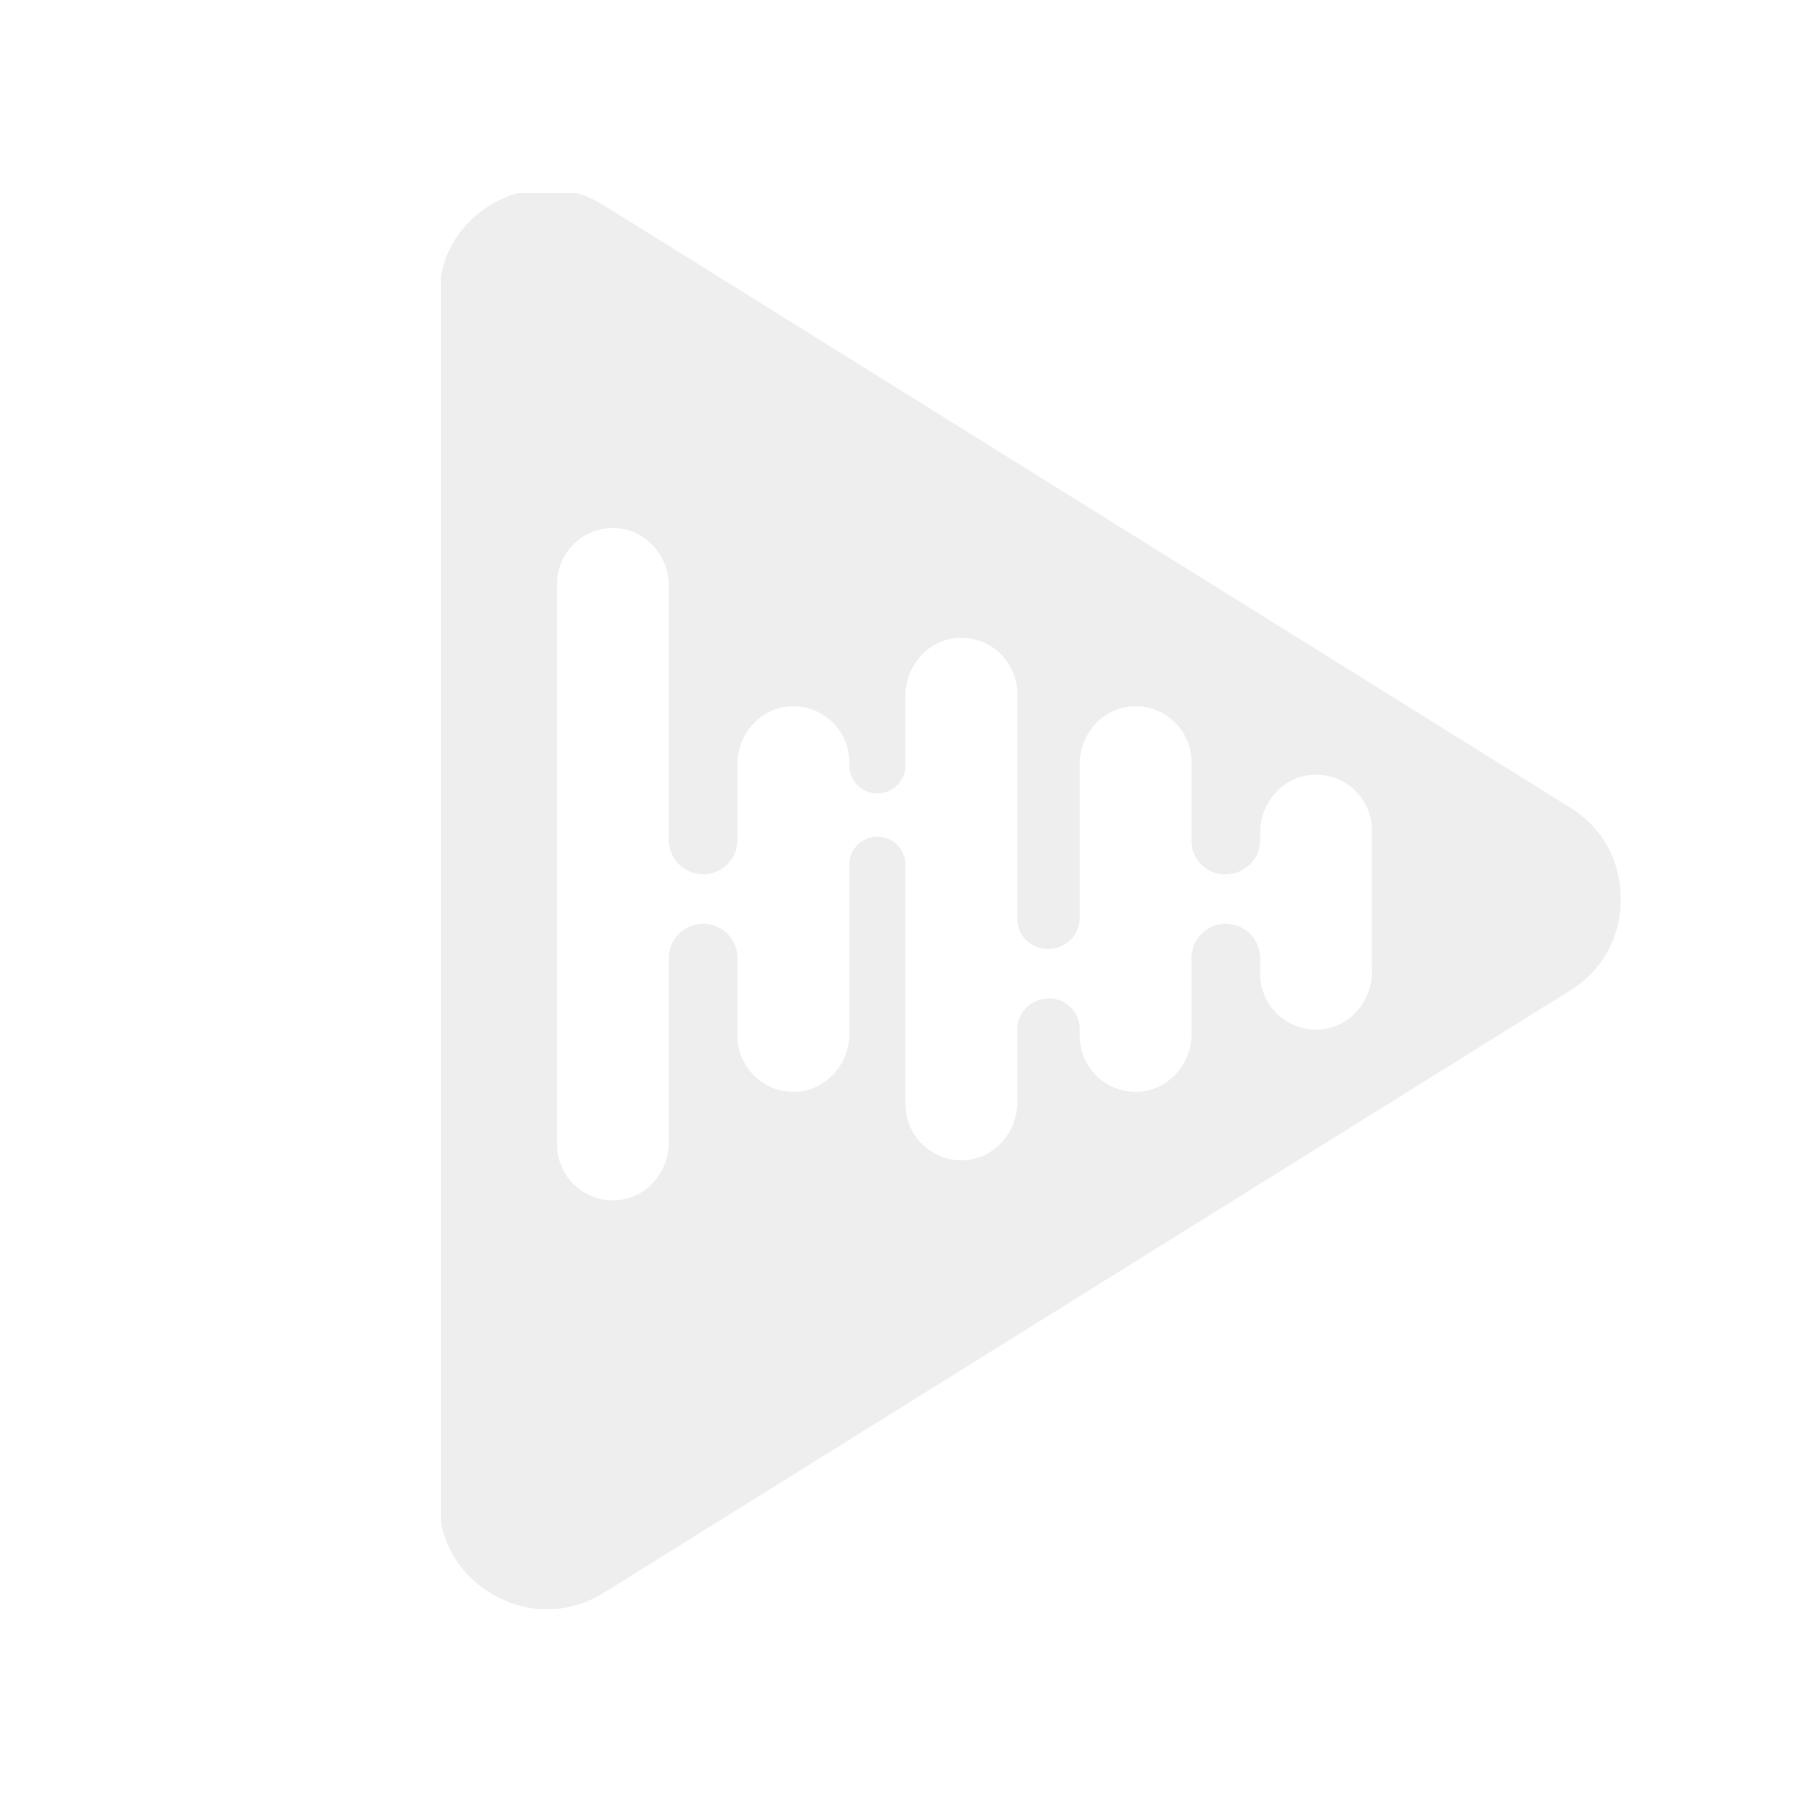 Autodab SWC C2DAB-HY5